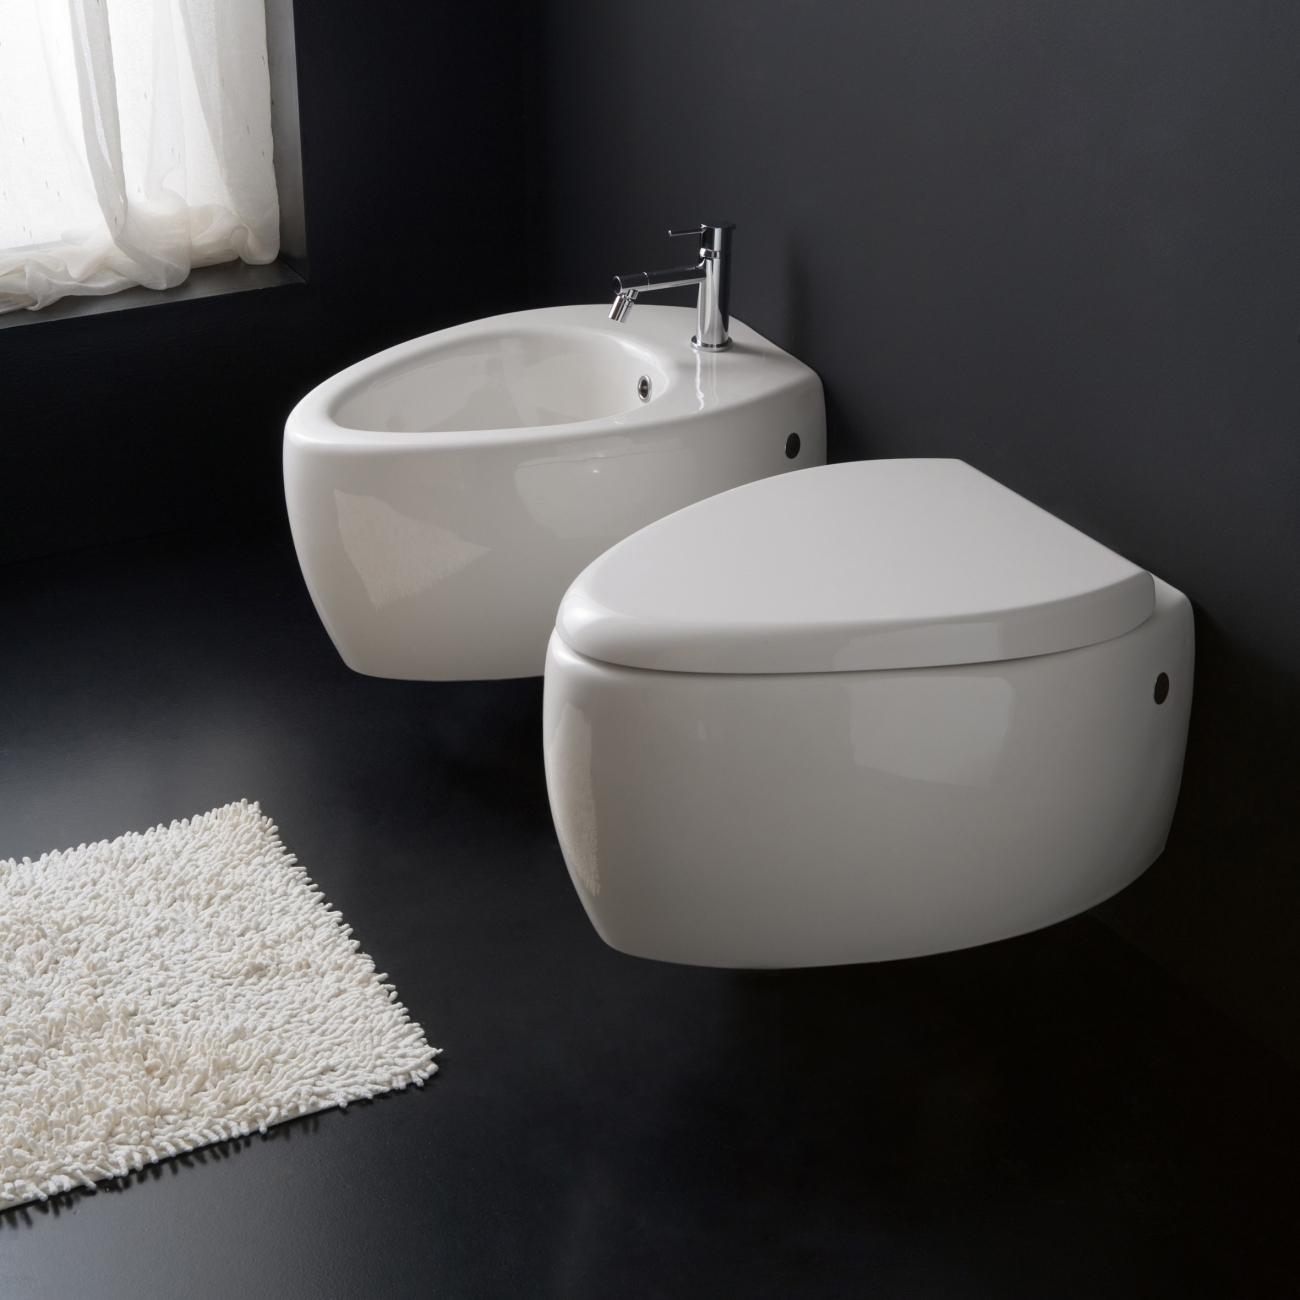 MOAI SCARABEO Wall-mounted WC